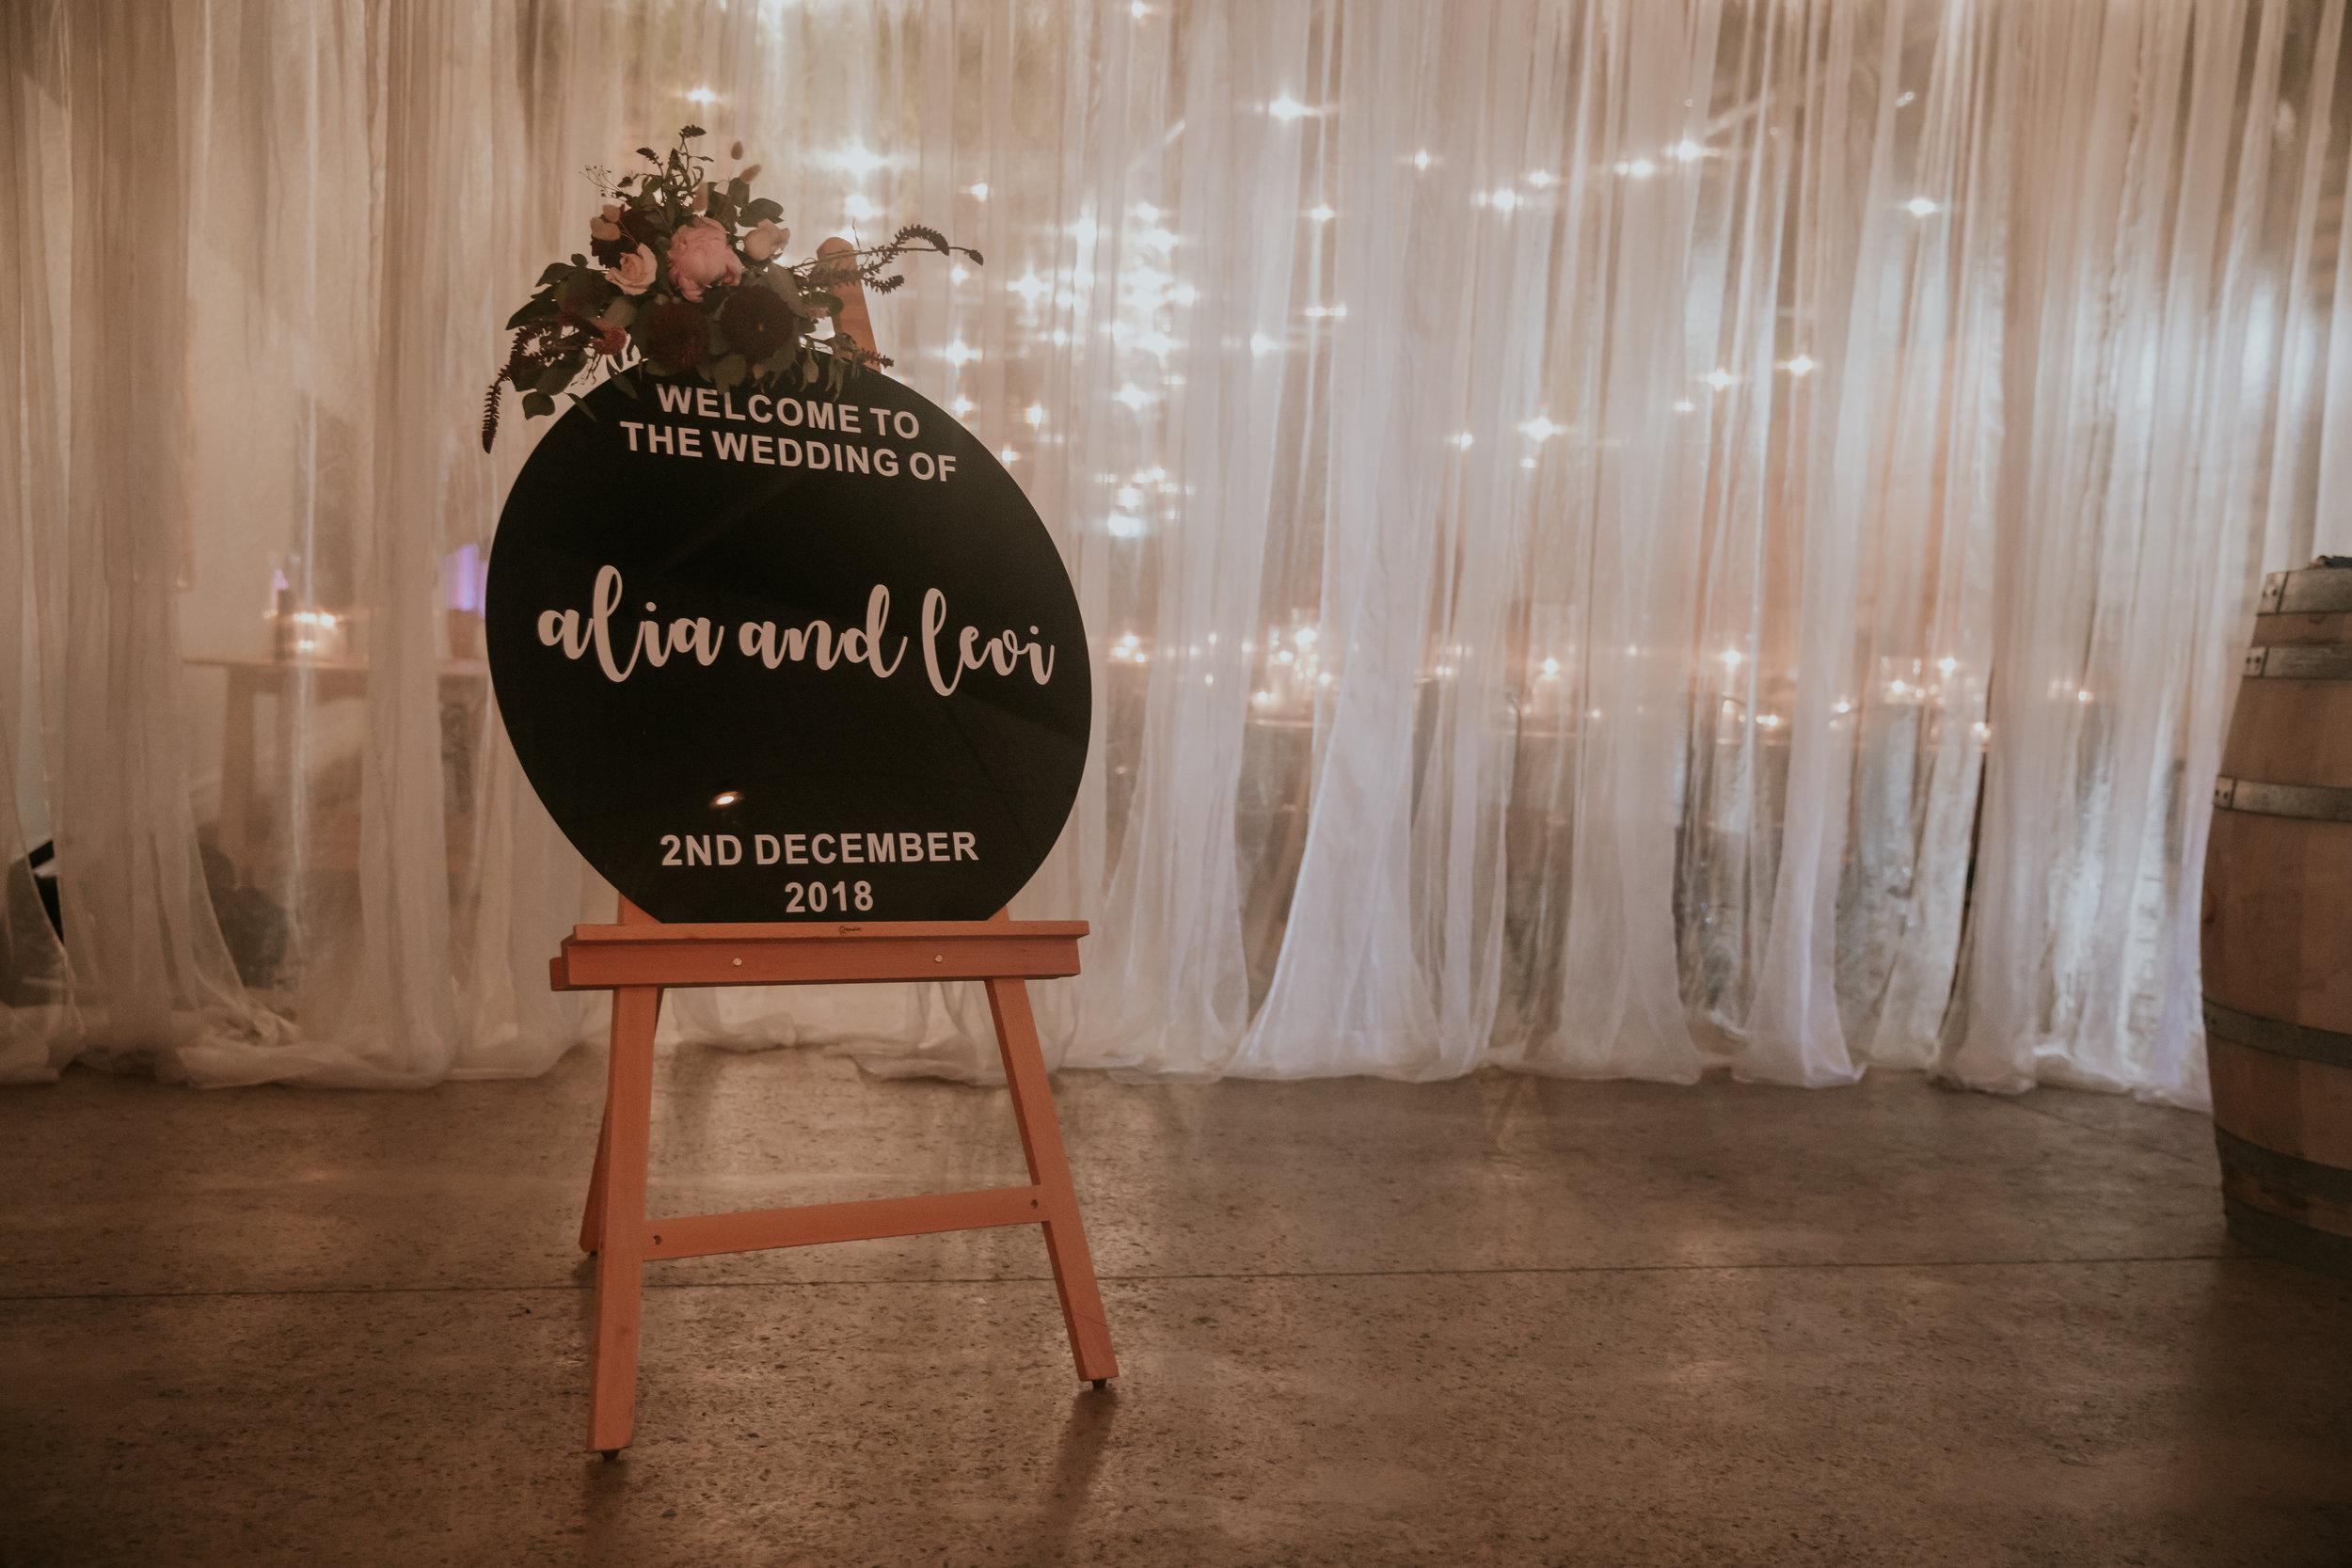 W.Travis-Benny-weddings-wedding-photographer-adelaide-Alia-Levi-1-706.jpg